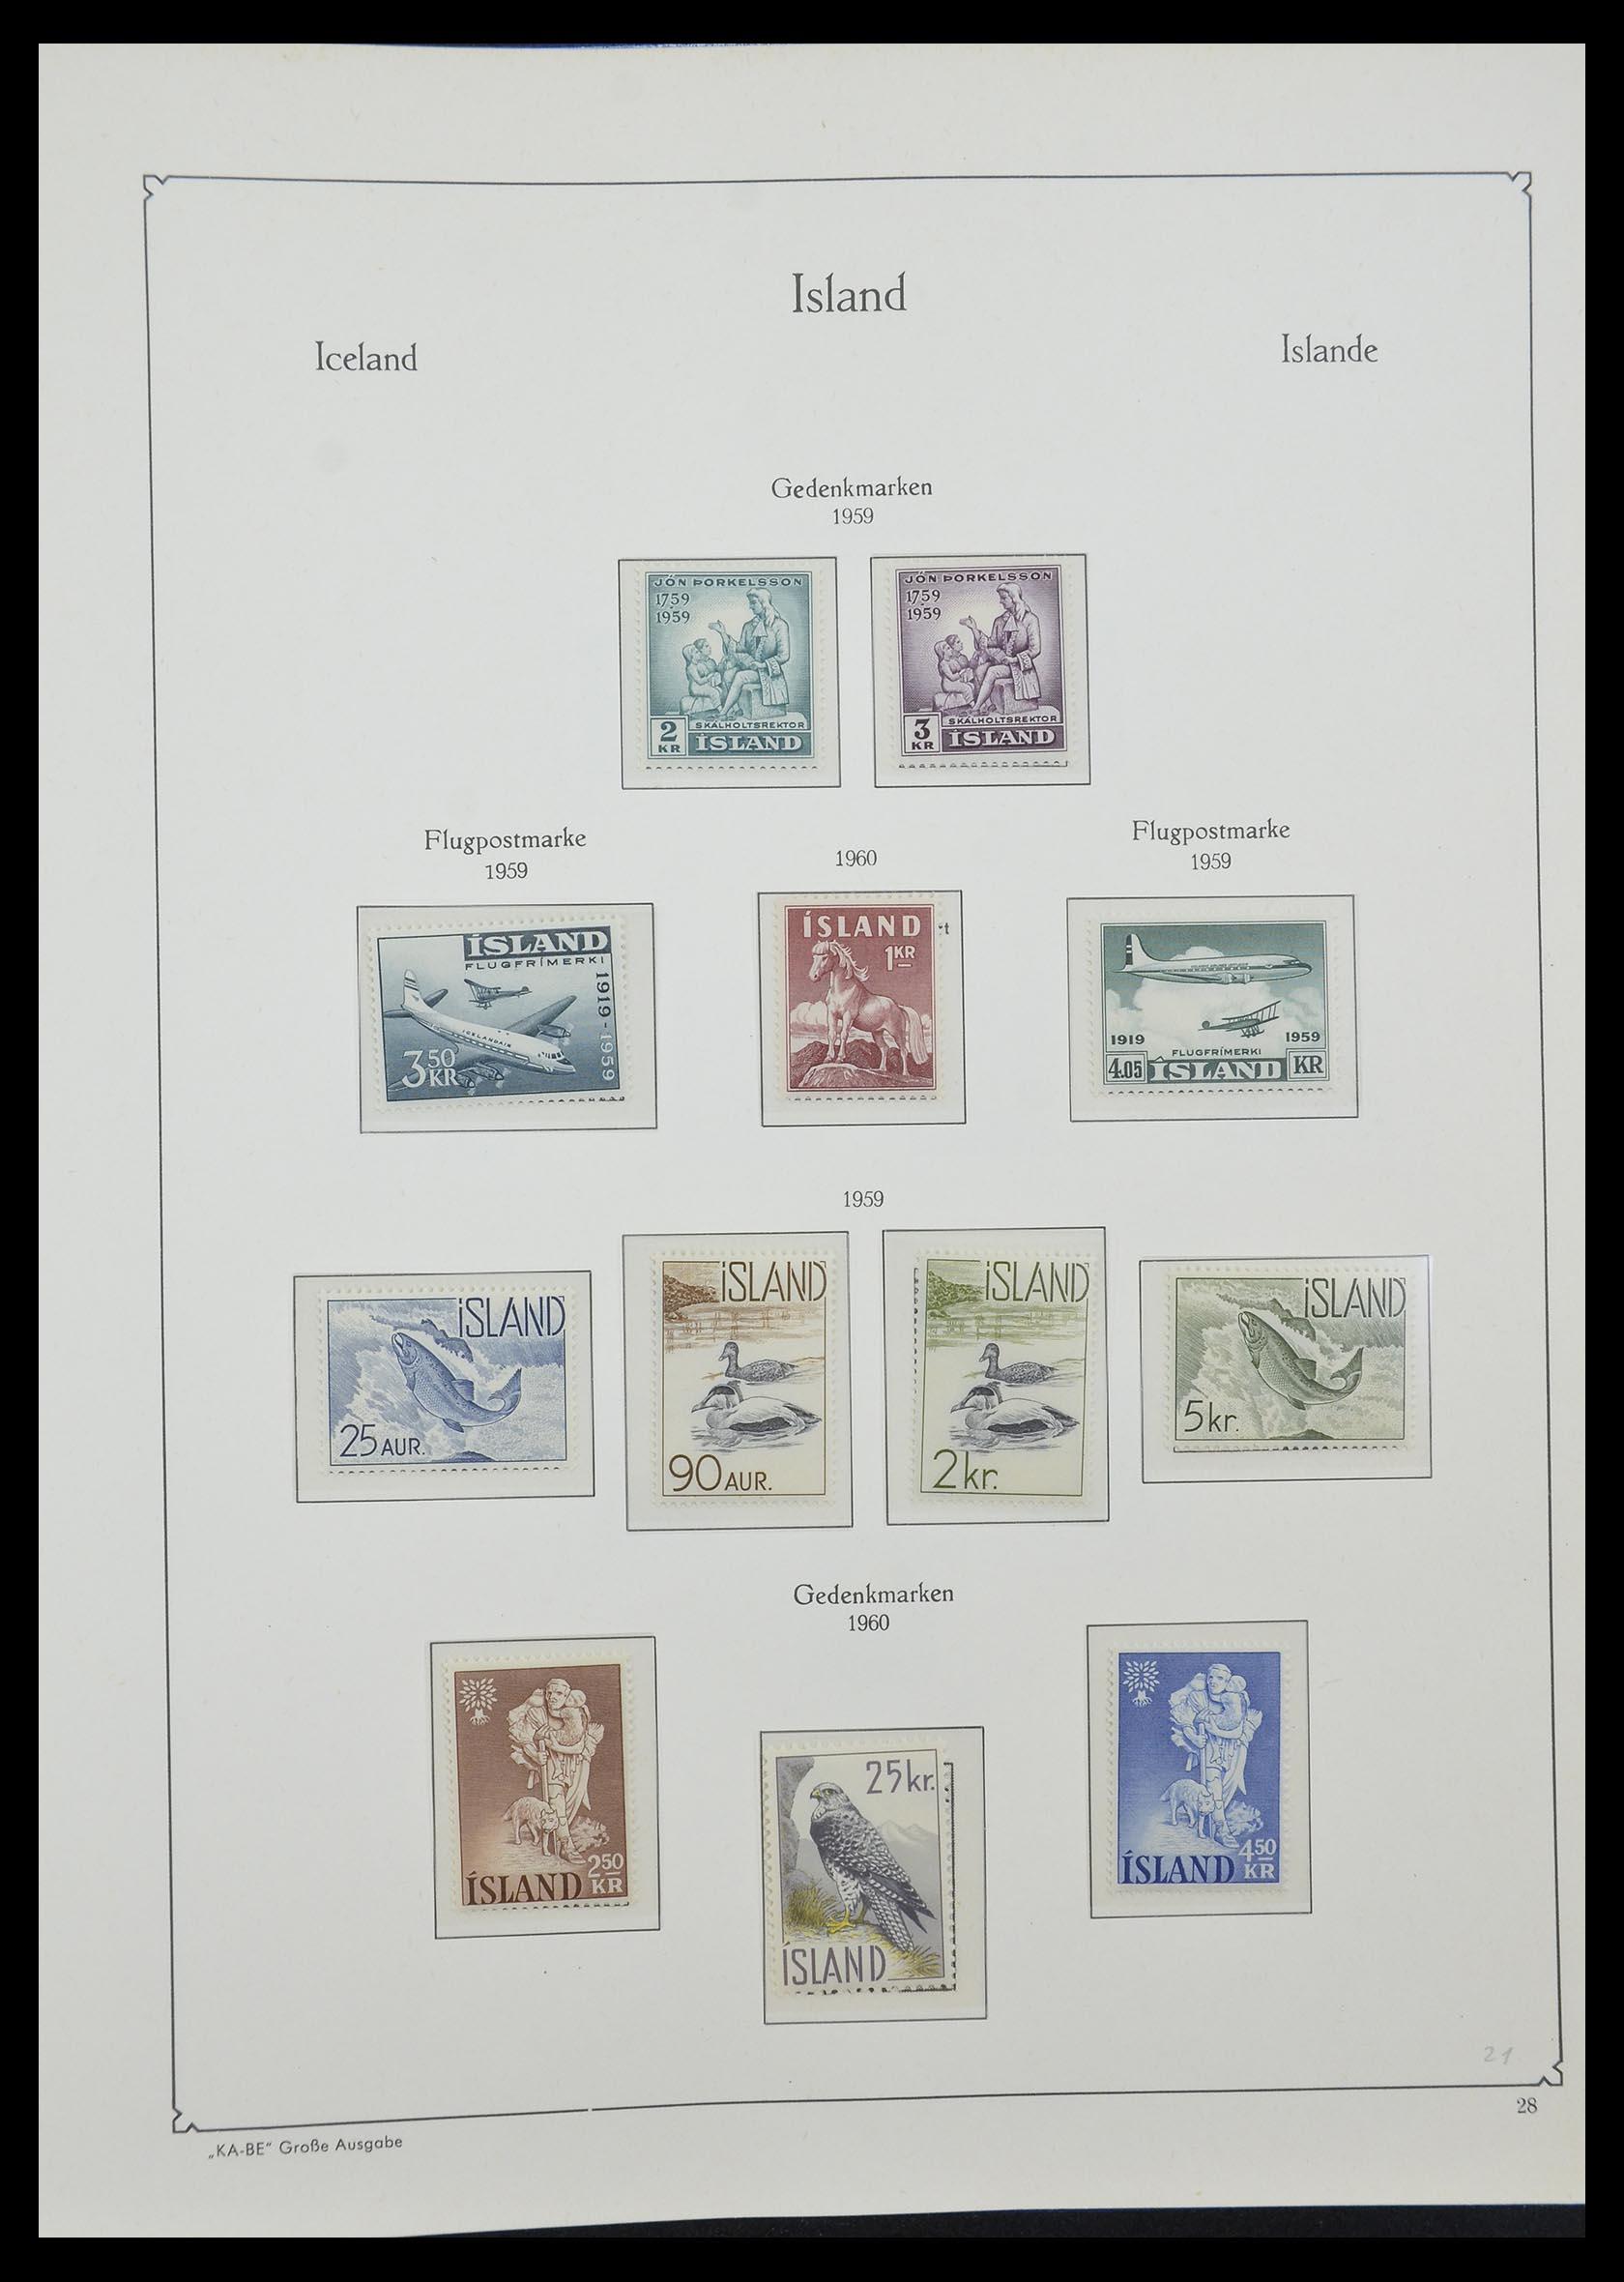 33185 011 - Postzegelverzameling 33184 Finland 1856-1990.